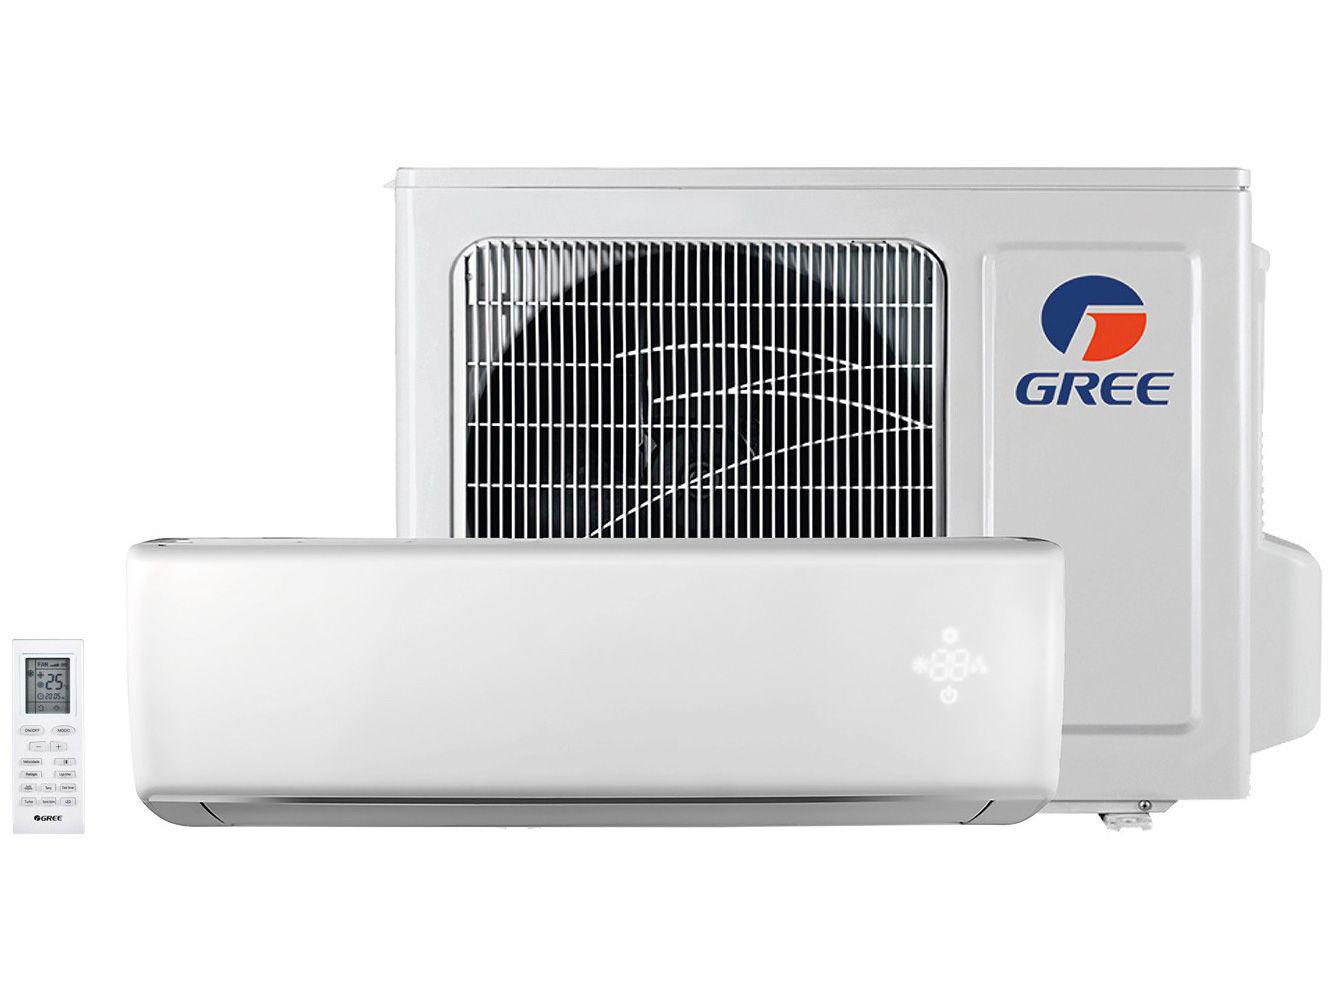 Ar-condicionado Split Gree 30.000 BTUs Frio - Eco Garden